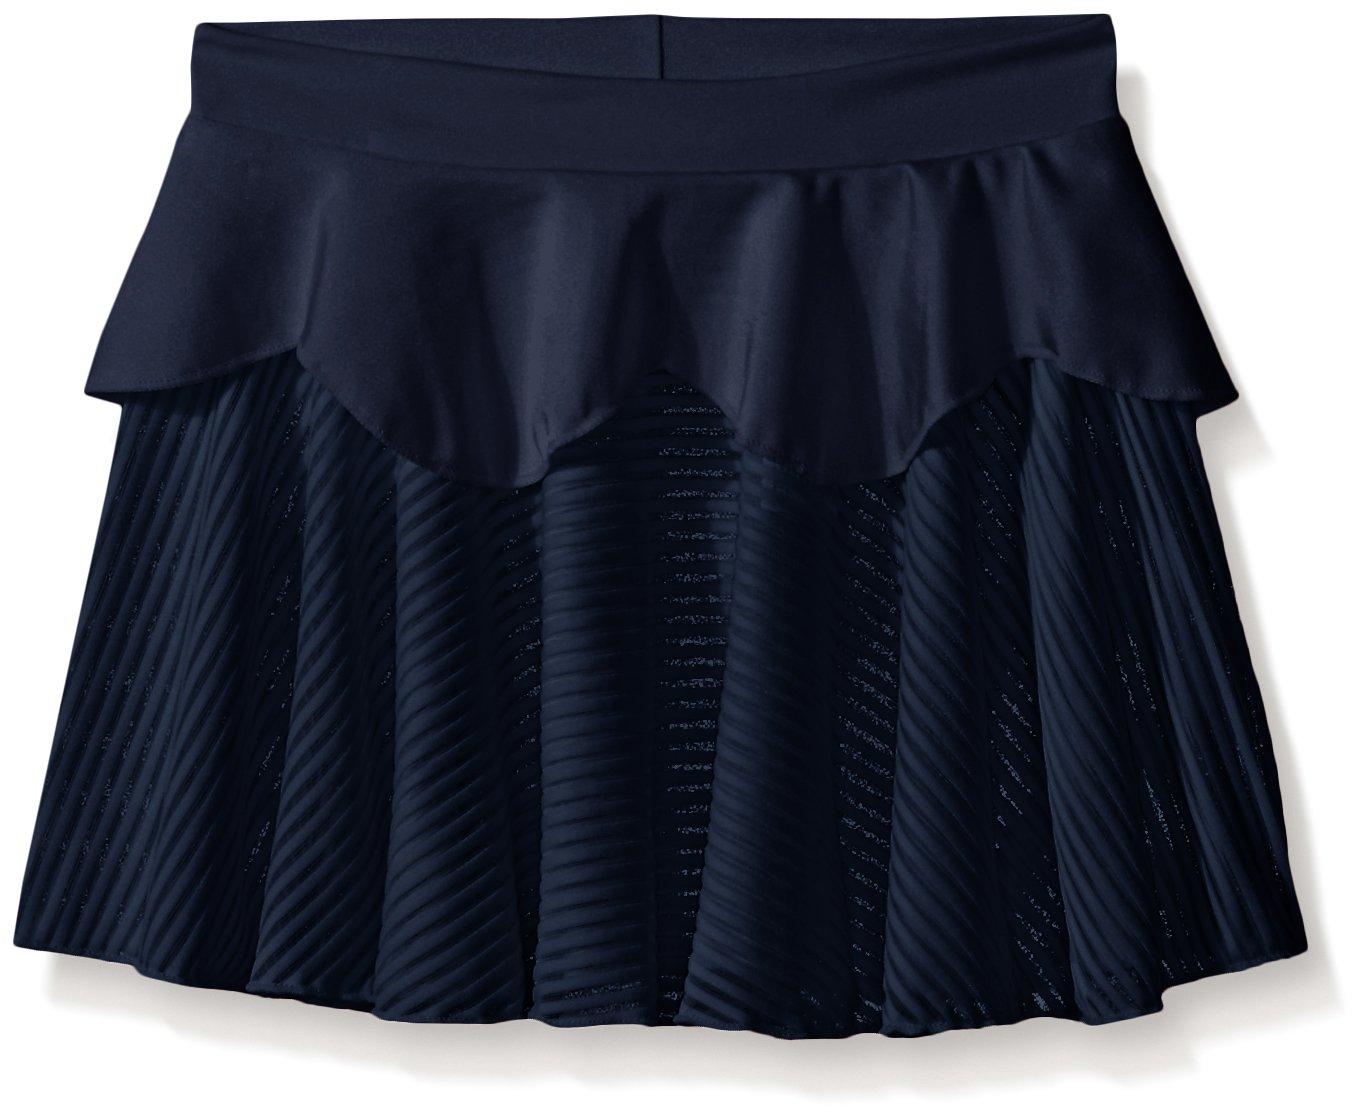 Capezio Girls' Anastasia Skirt 10816C